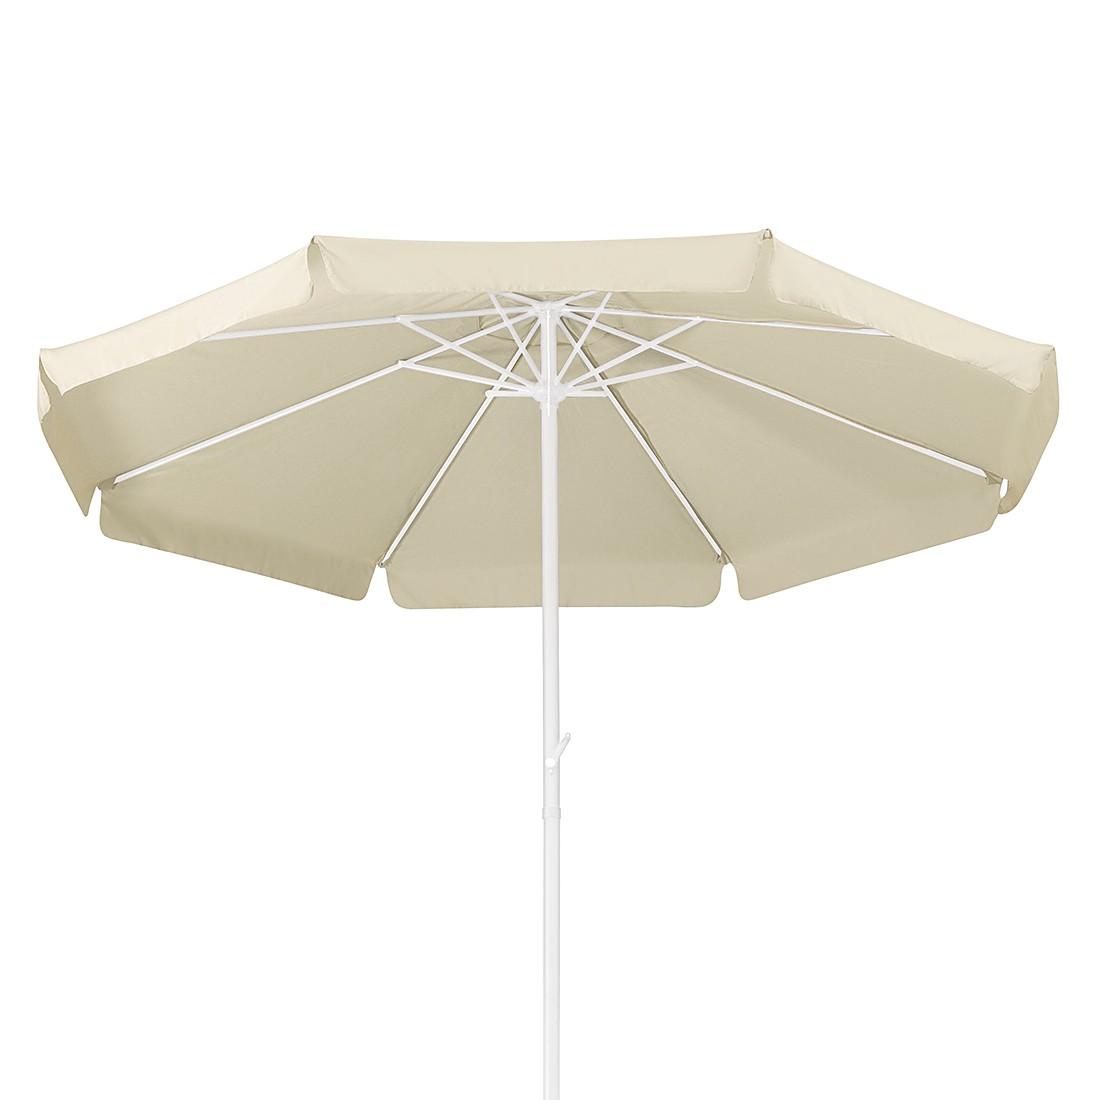 sonnenschirm blossom stahl polyester anthrazit pink leco g nstig online kaufen. Black Bedroom Furniture Sets. Home Design Ideas